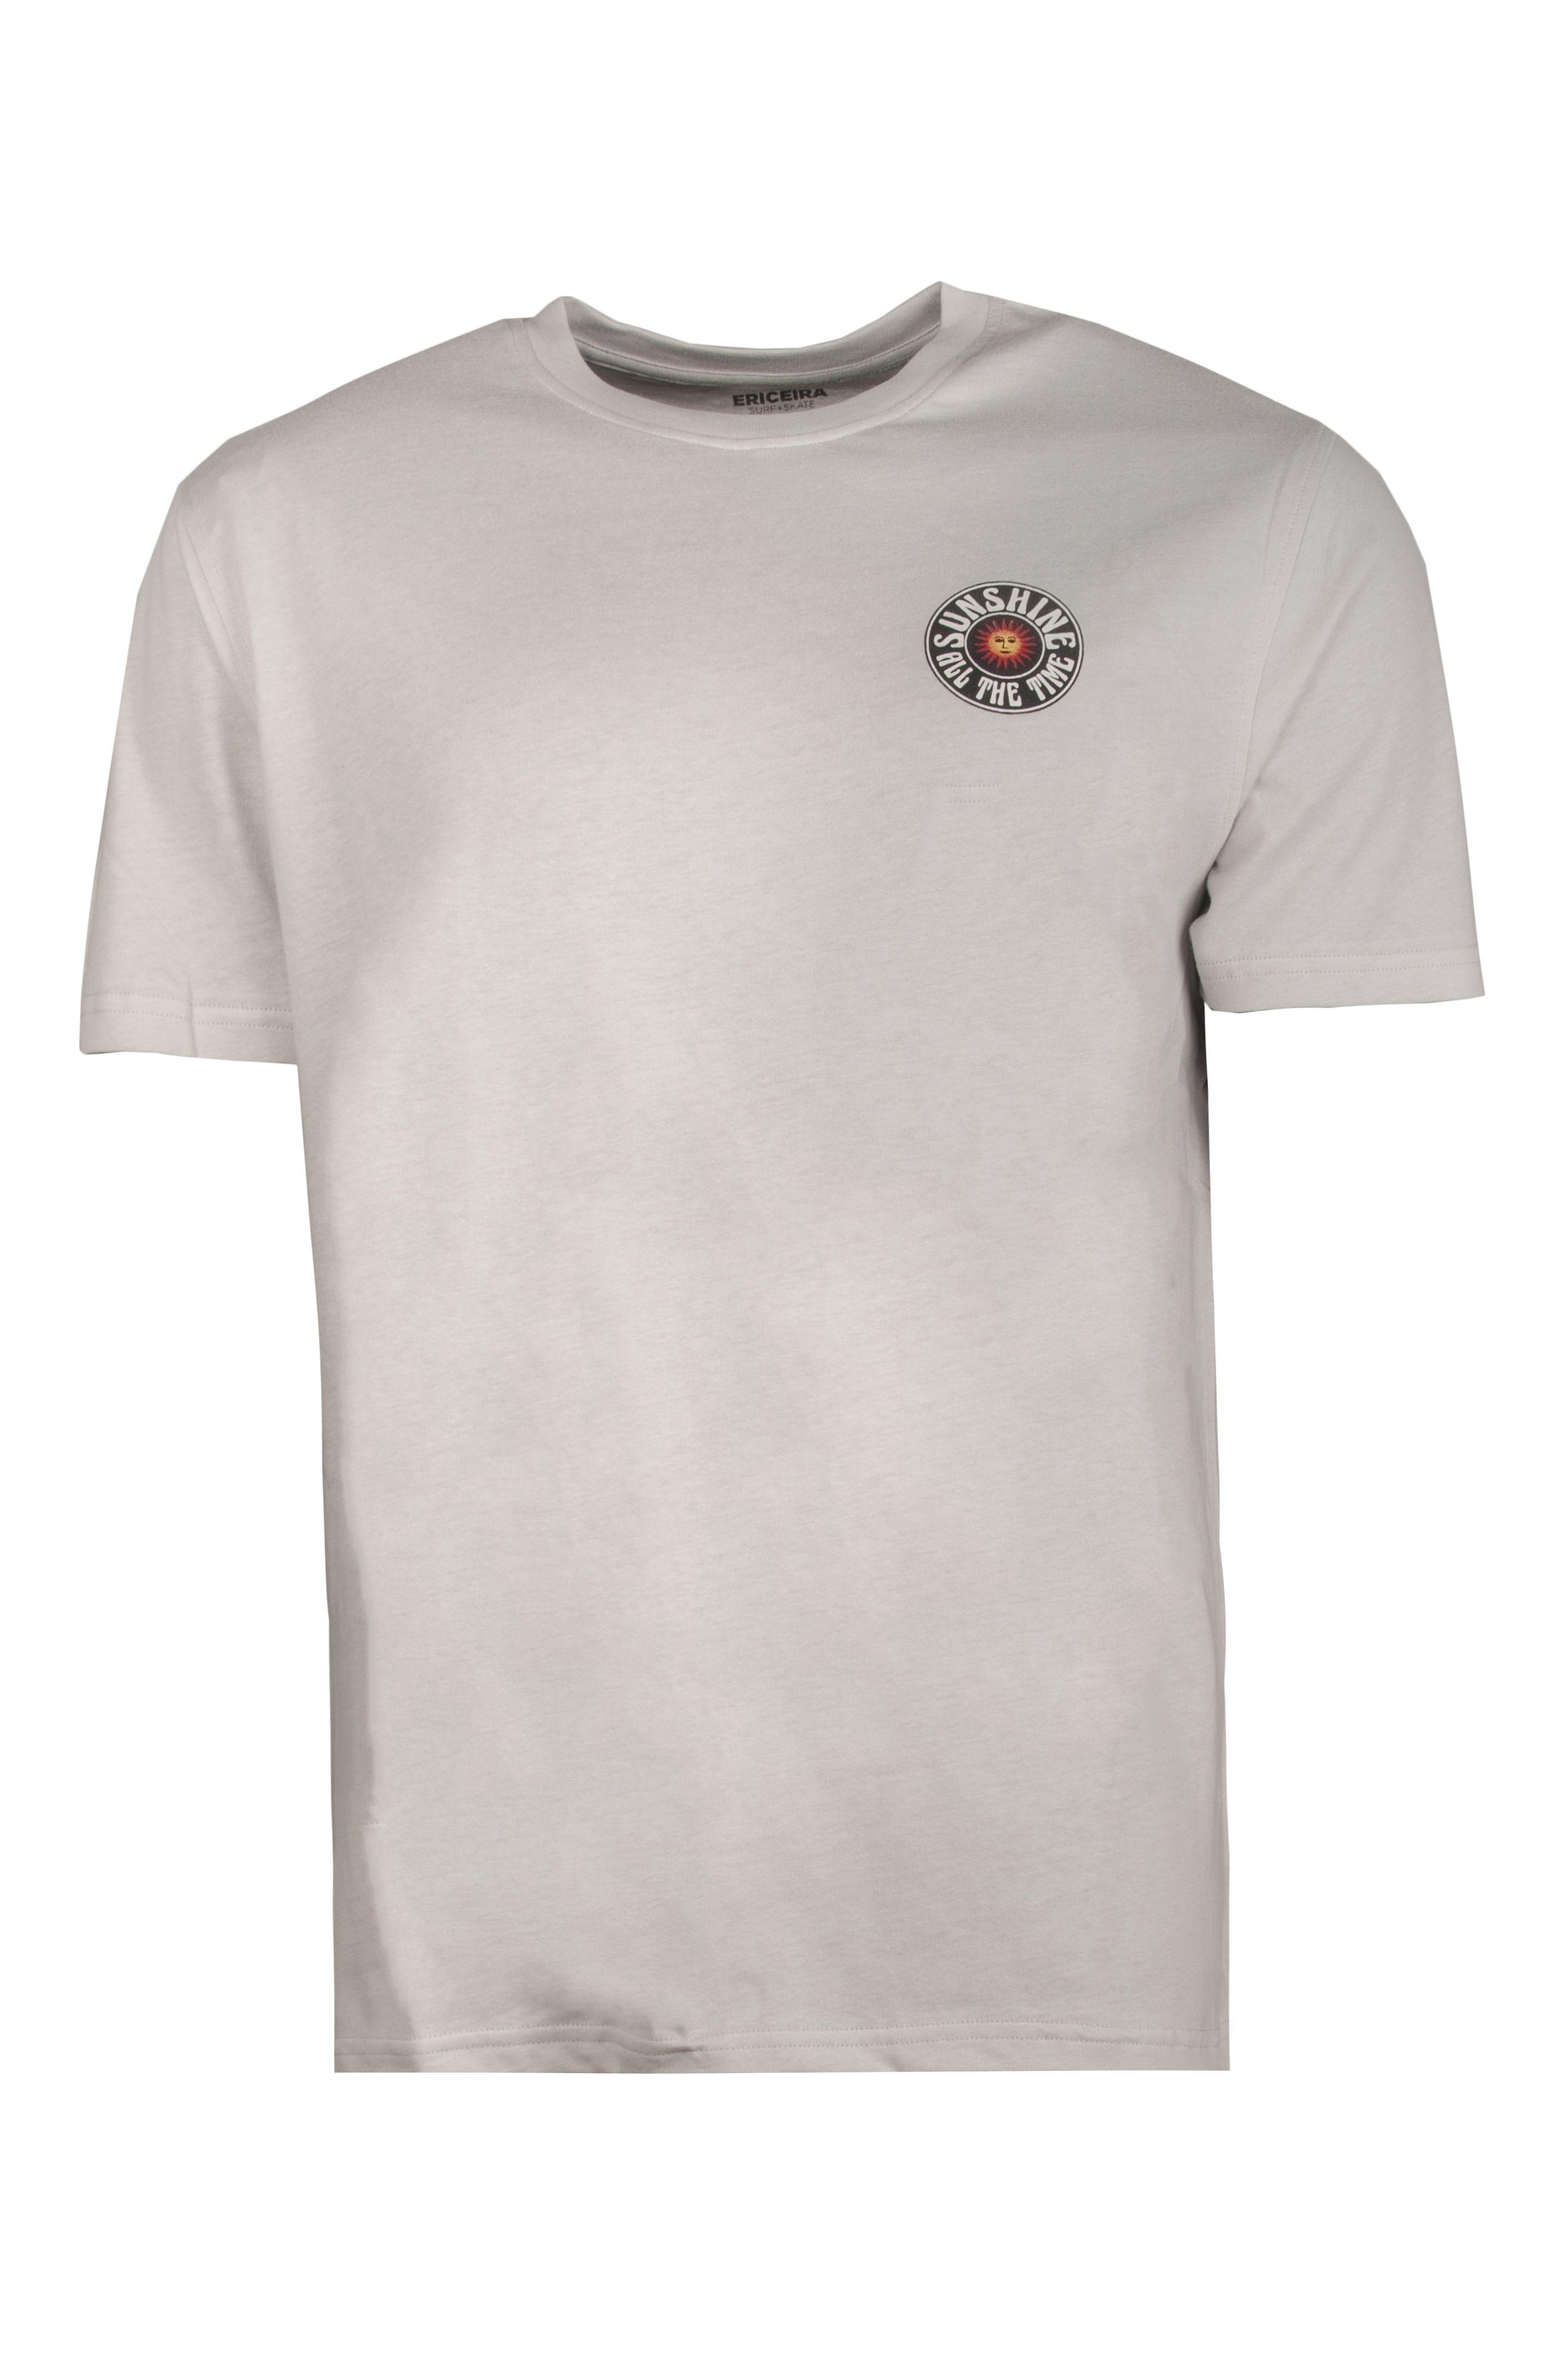 Ericeira Surf Skate T-Shirt SUN SMILE Off White